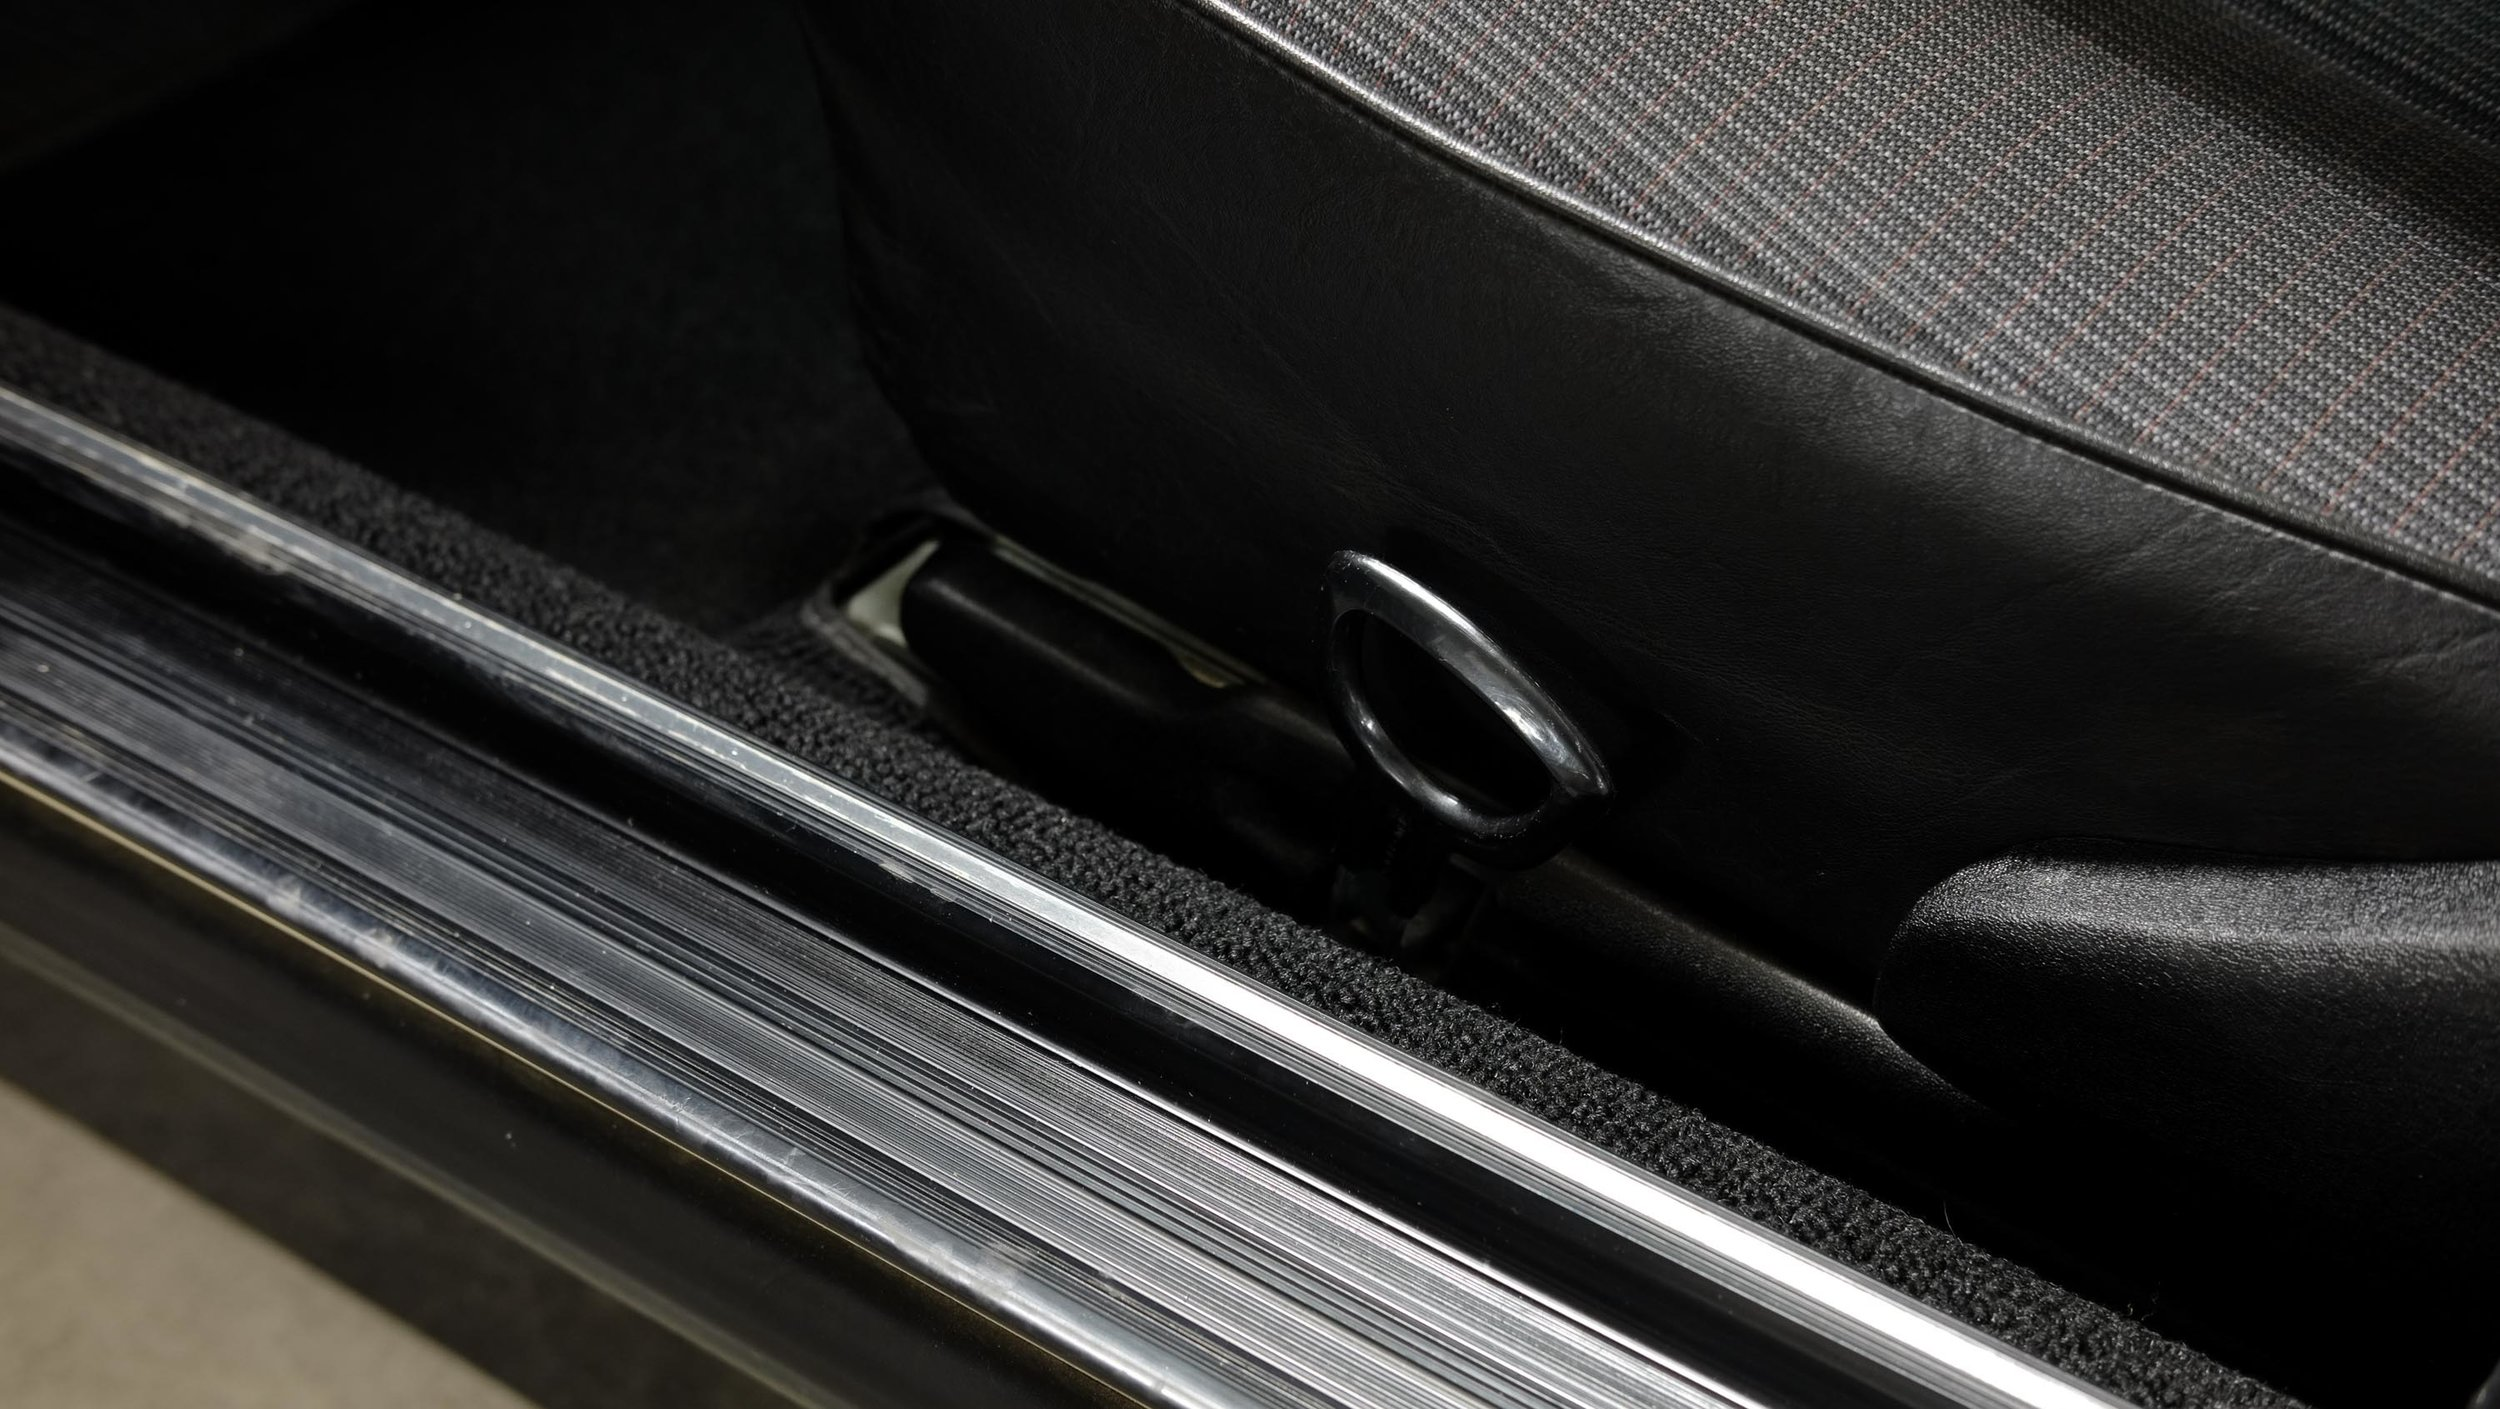 coolnvintage Mercedes-Benz W123 300D (53 of 59).jpg